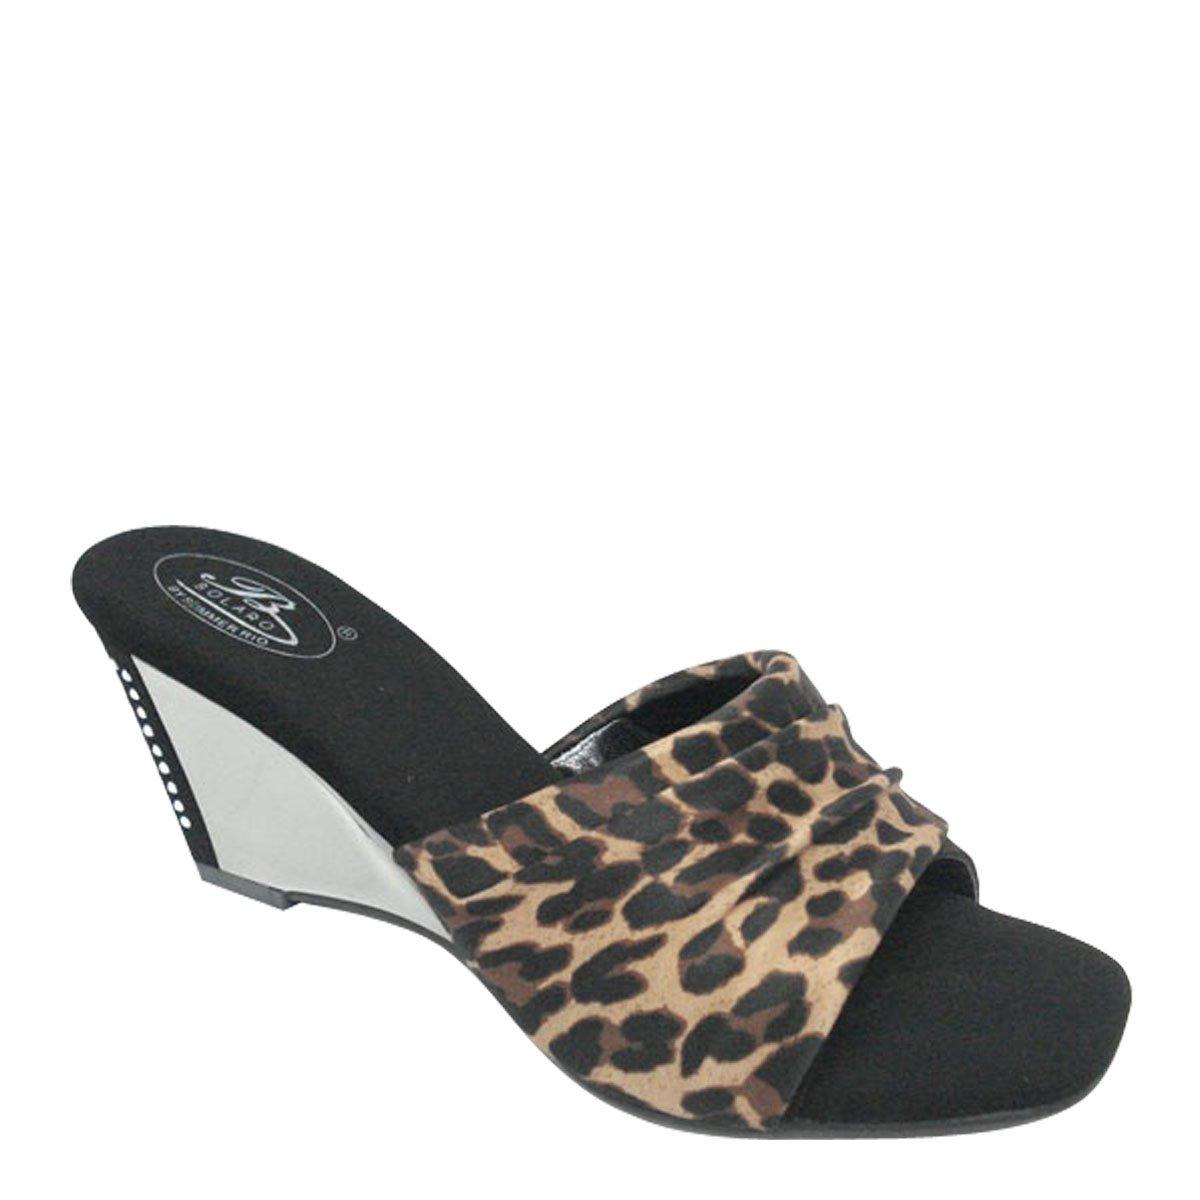 New Brieten Women's Rhinestone Wedge Comfort Slide Sandals B00HRLDLVA 8 B(M) US Leopard